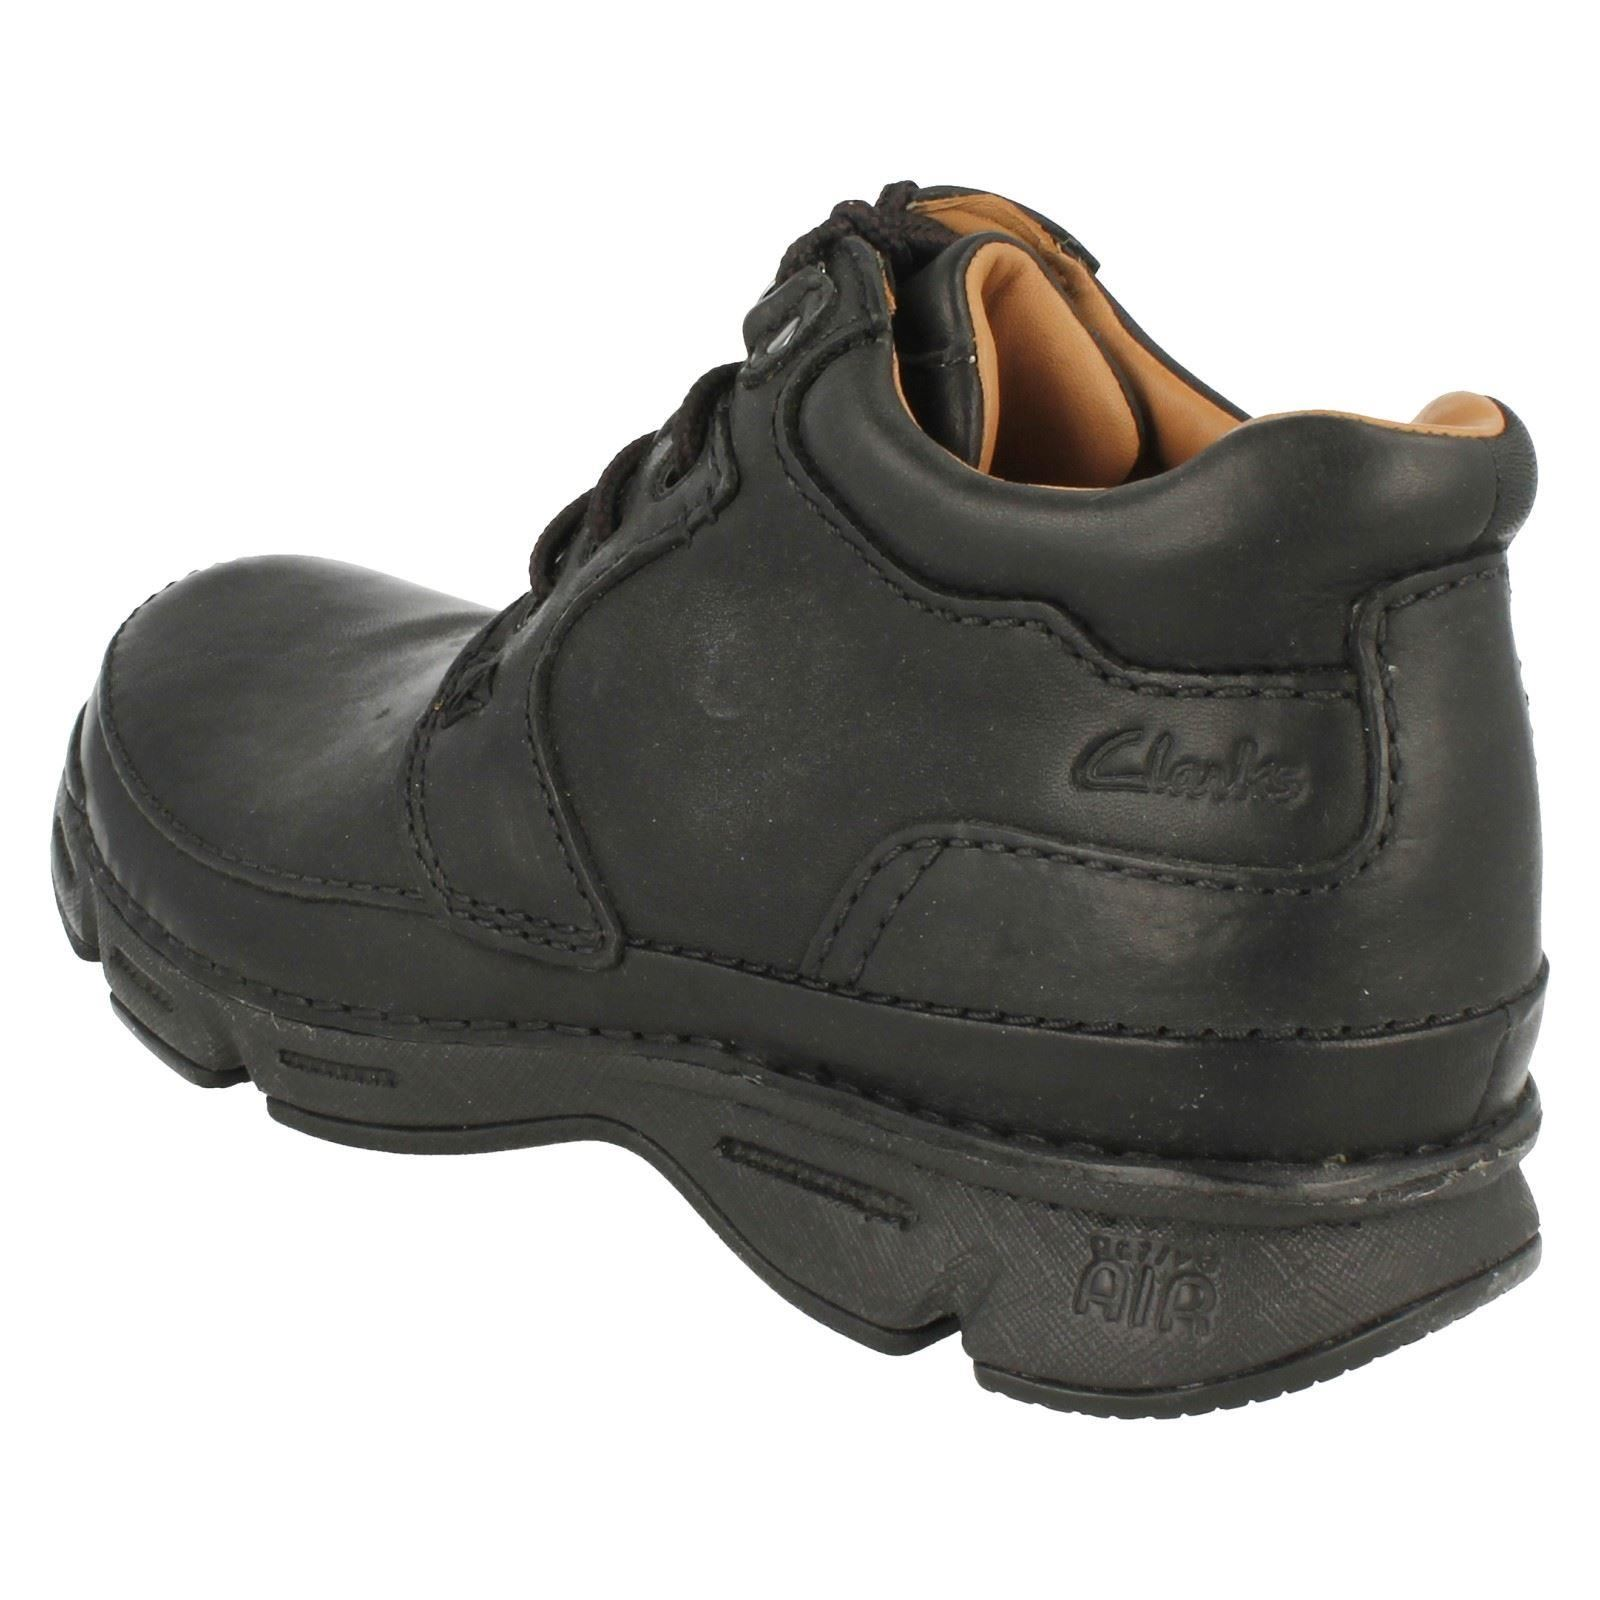 clarks airwalk mens shoes